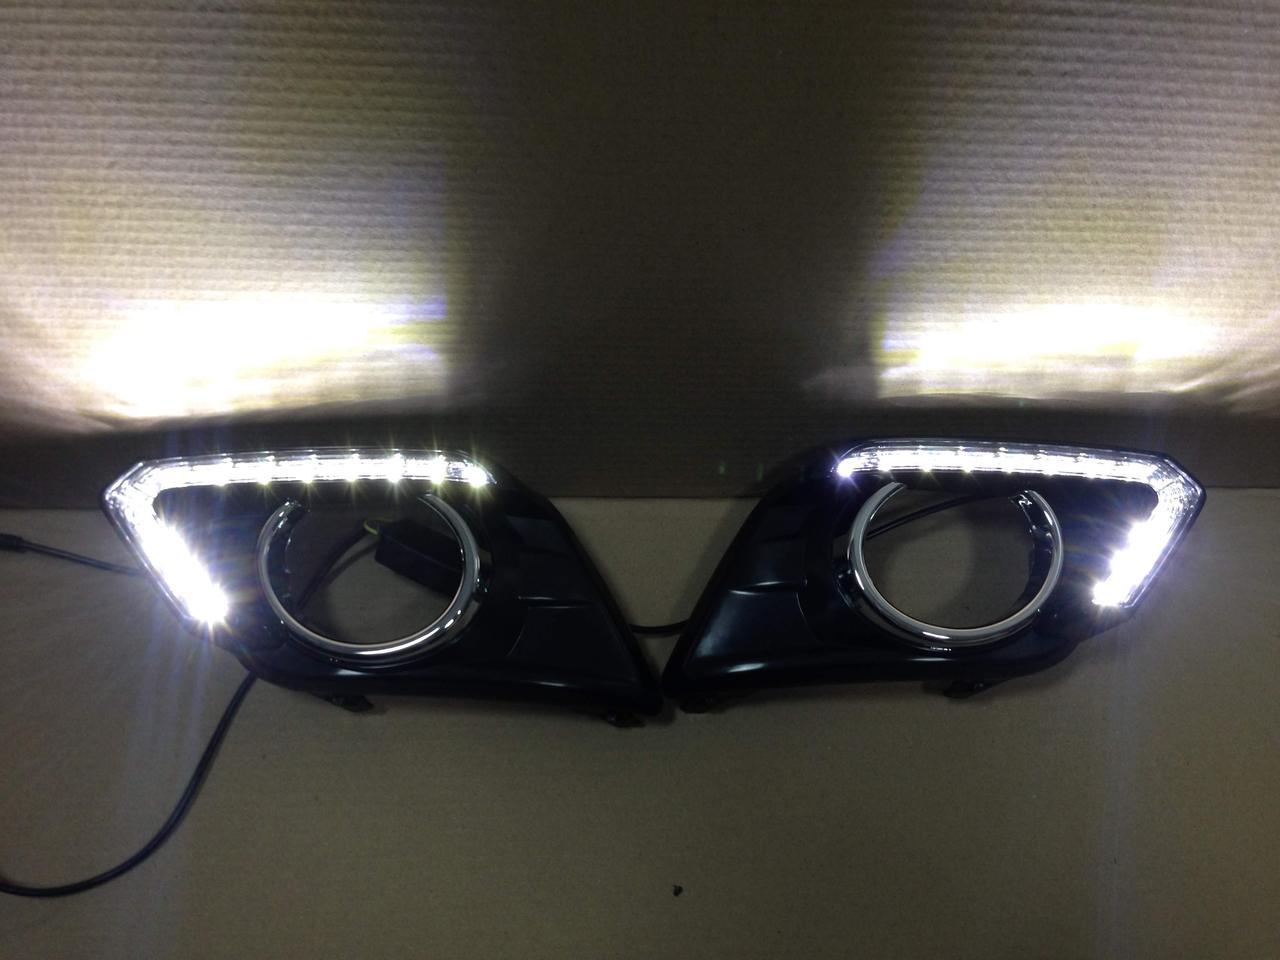 DRL ходовые огни с повторителями поворотов Nissan X-Trail T32 2014-2016 до рестайлинга